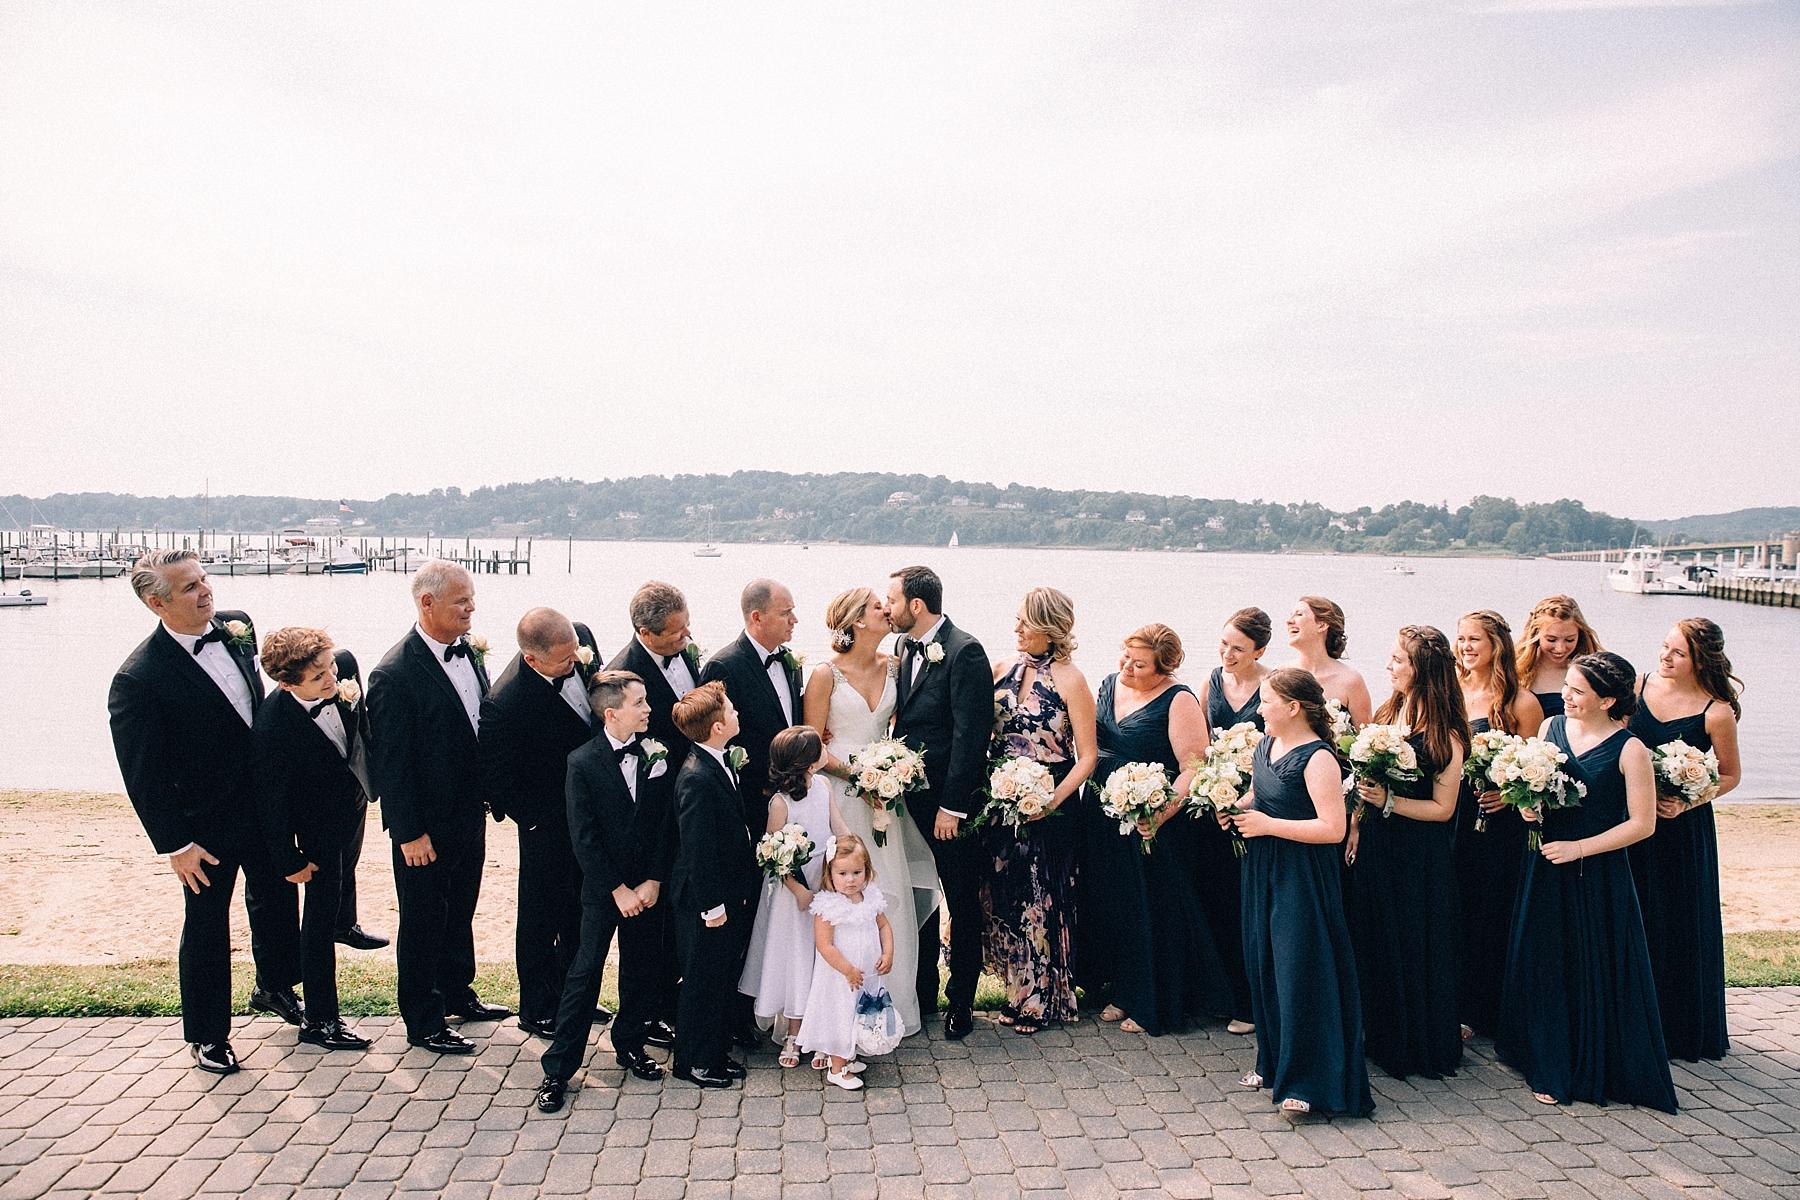 shadow_brook_nj_wedding_photographer_monmouth_county_0016.jpg